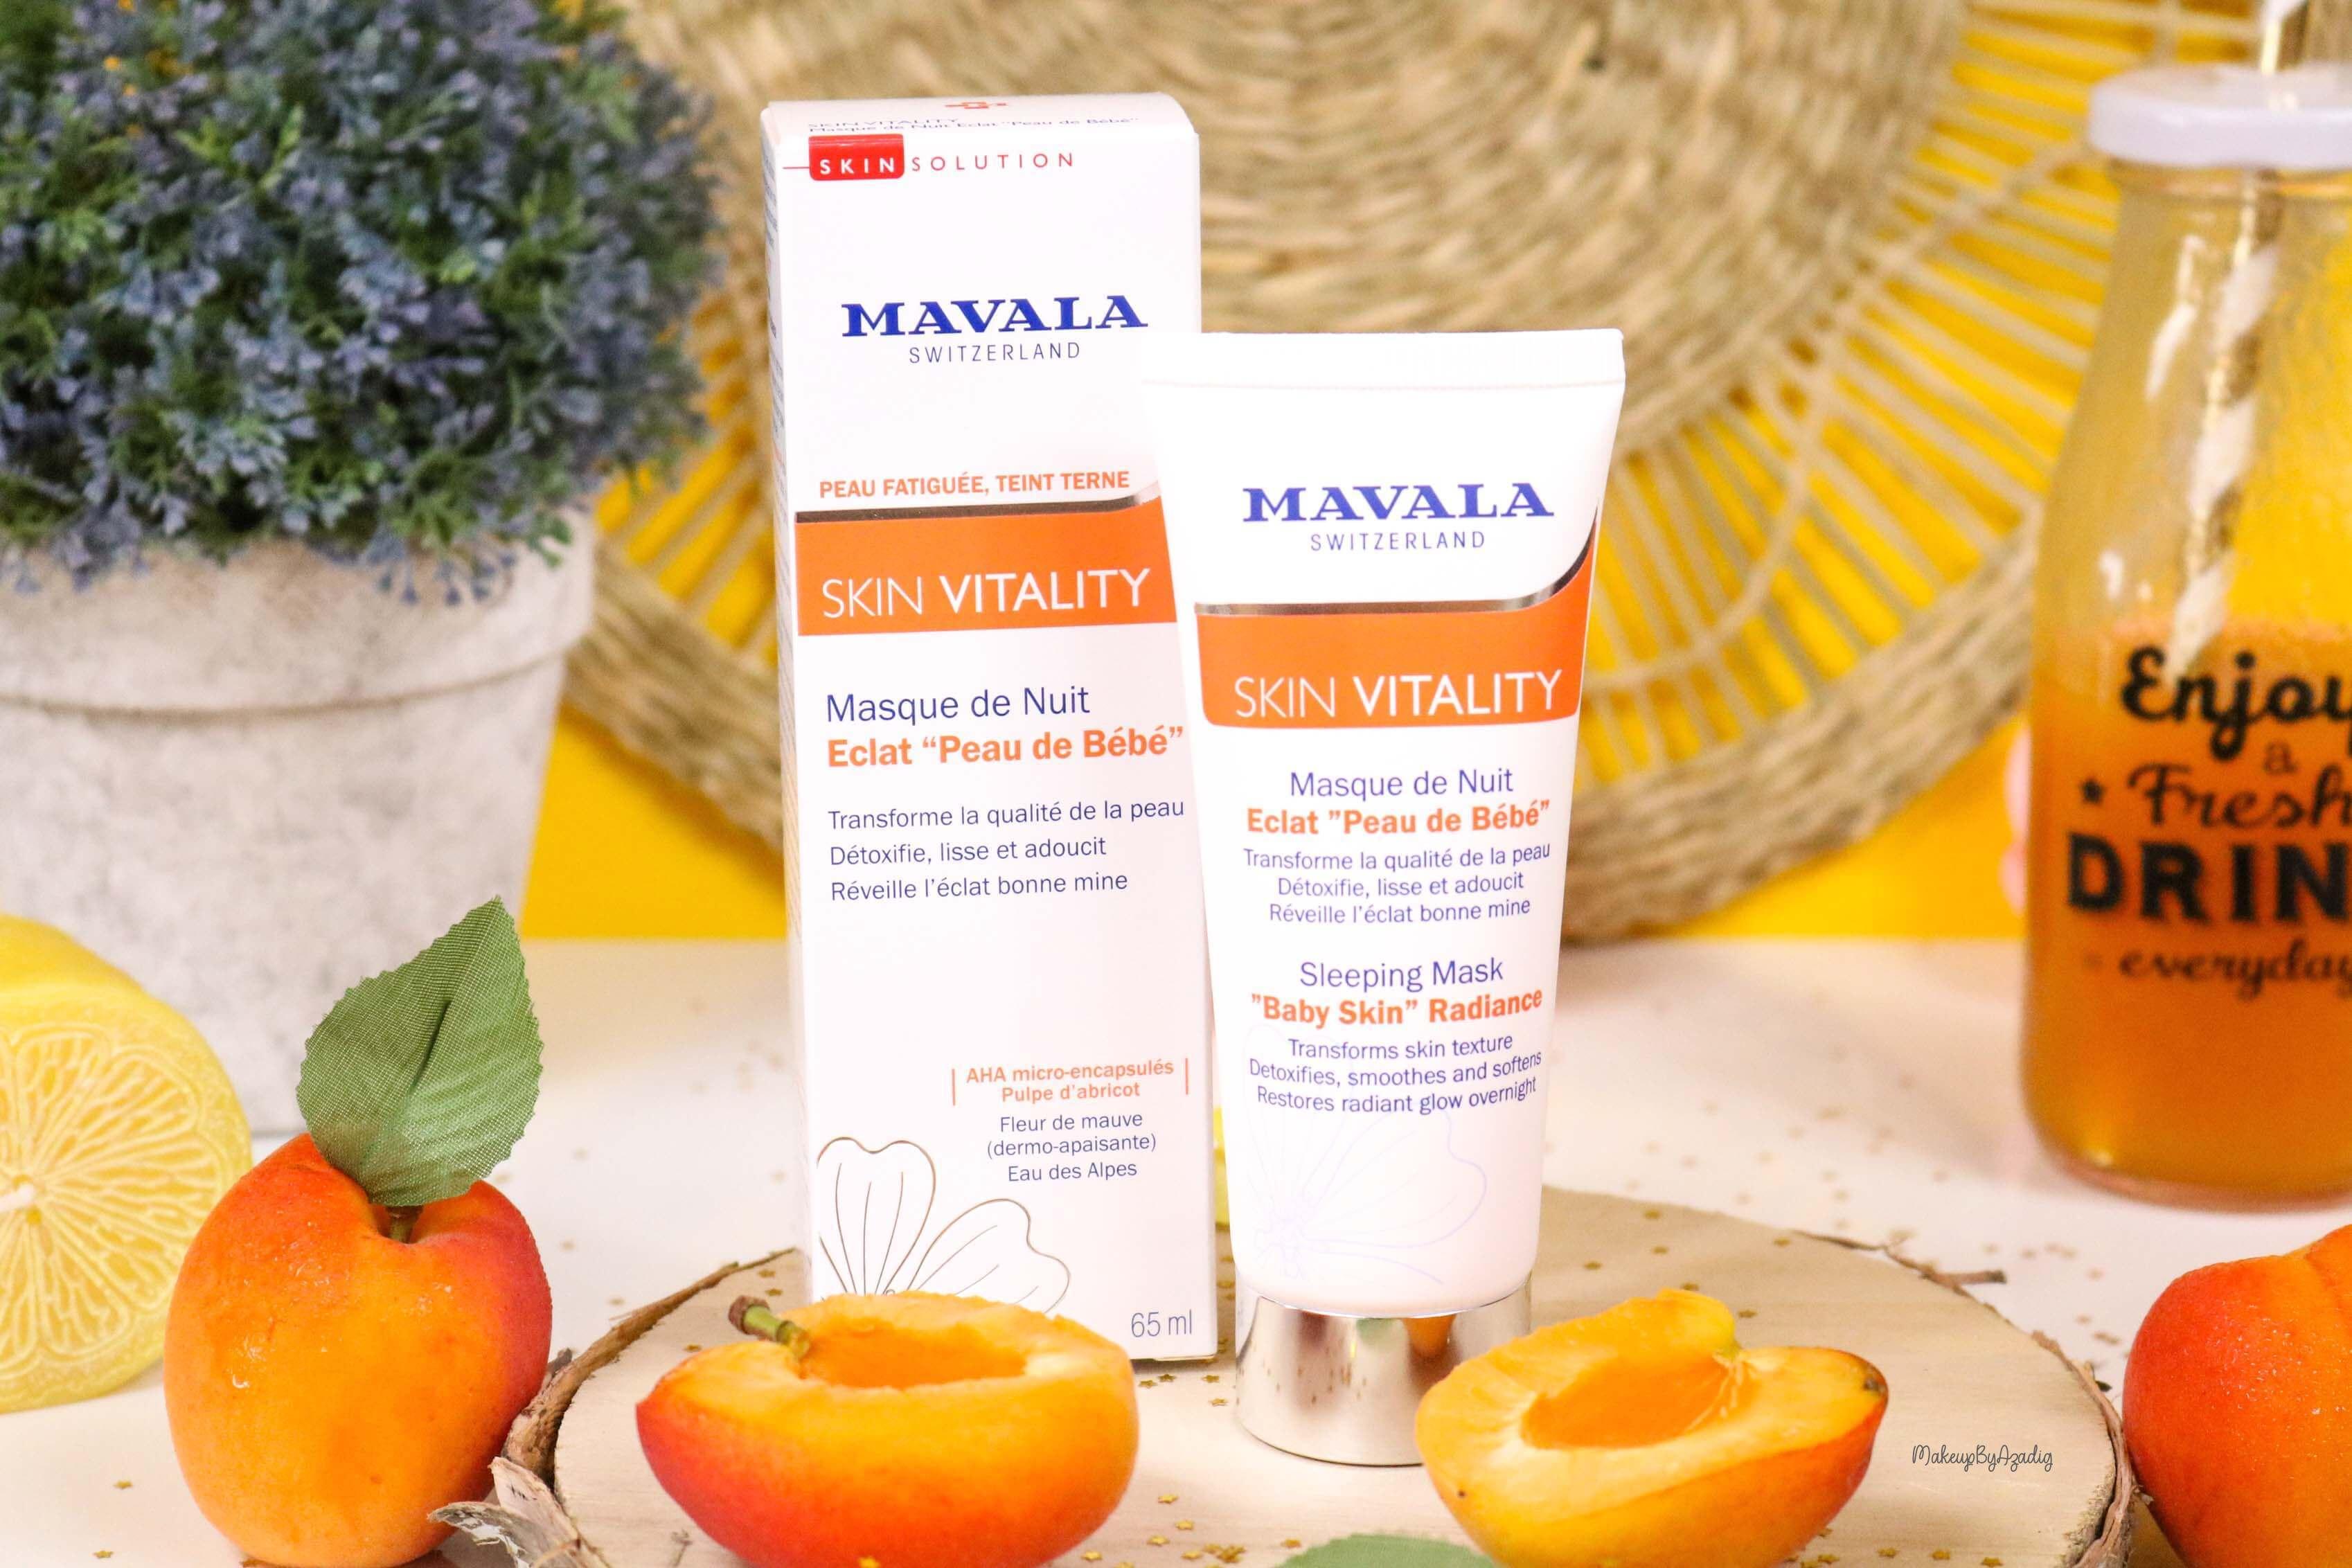 revue-routine-soin-bio-efficace-peau-sensible-skin-vitality-mavala-suisse-masque-nuit-serum-creme-jour-makeupbyazadig-bebe